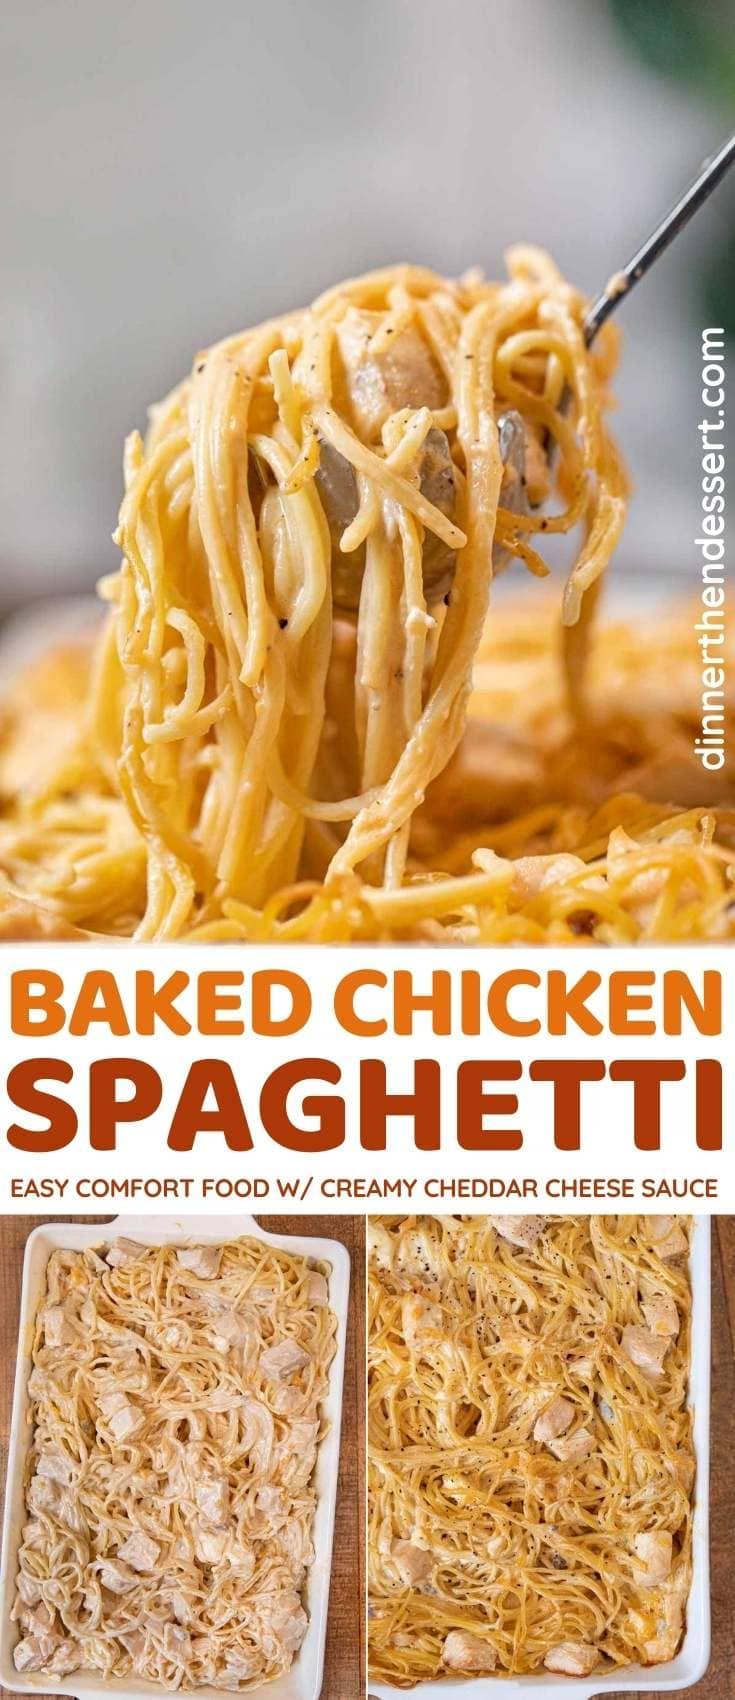 Baked Chicken Spaghetti collage